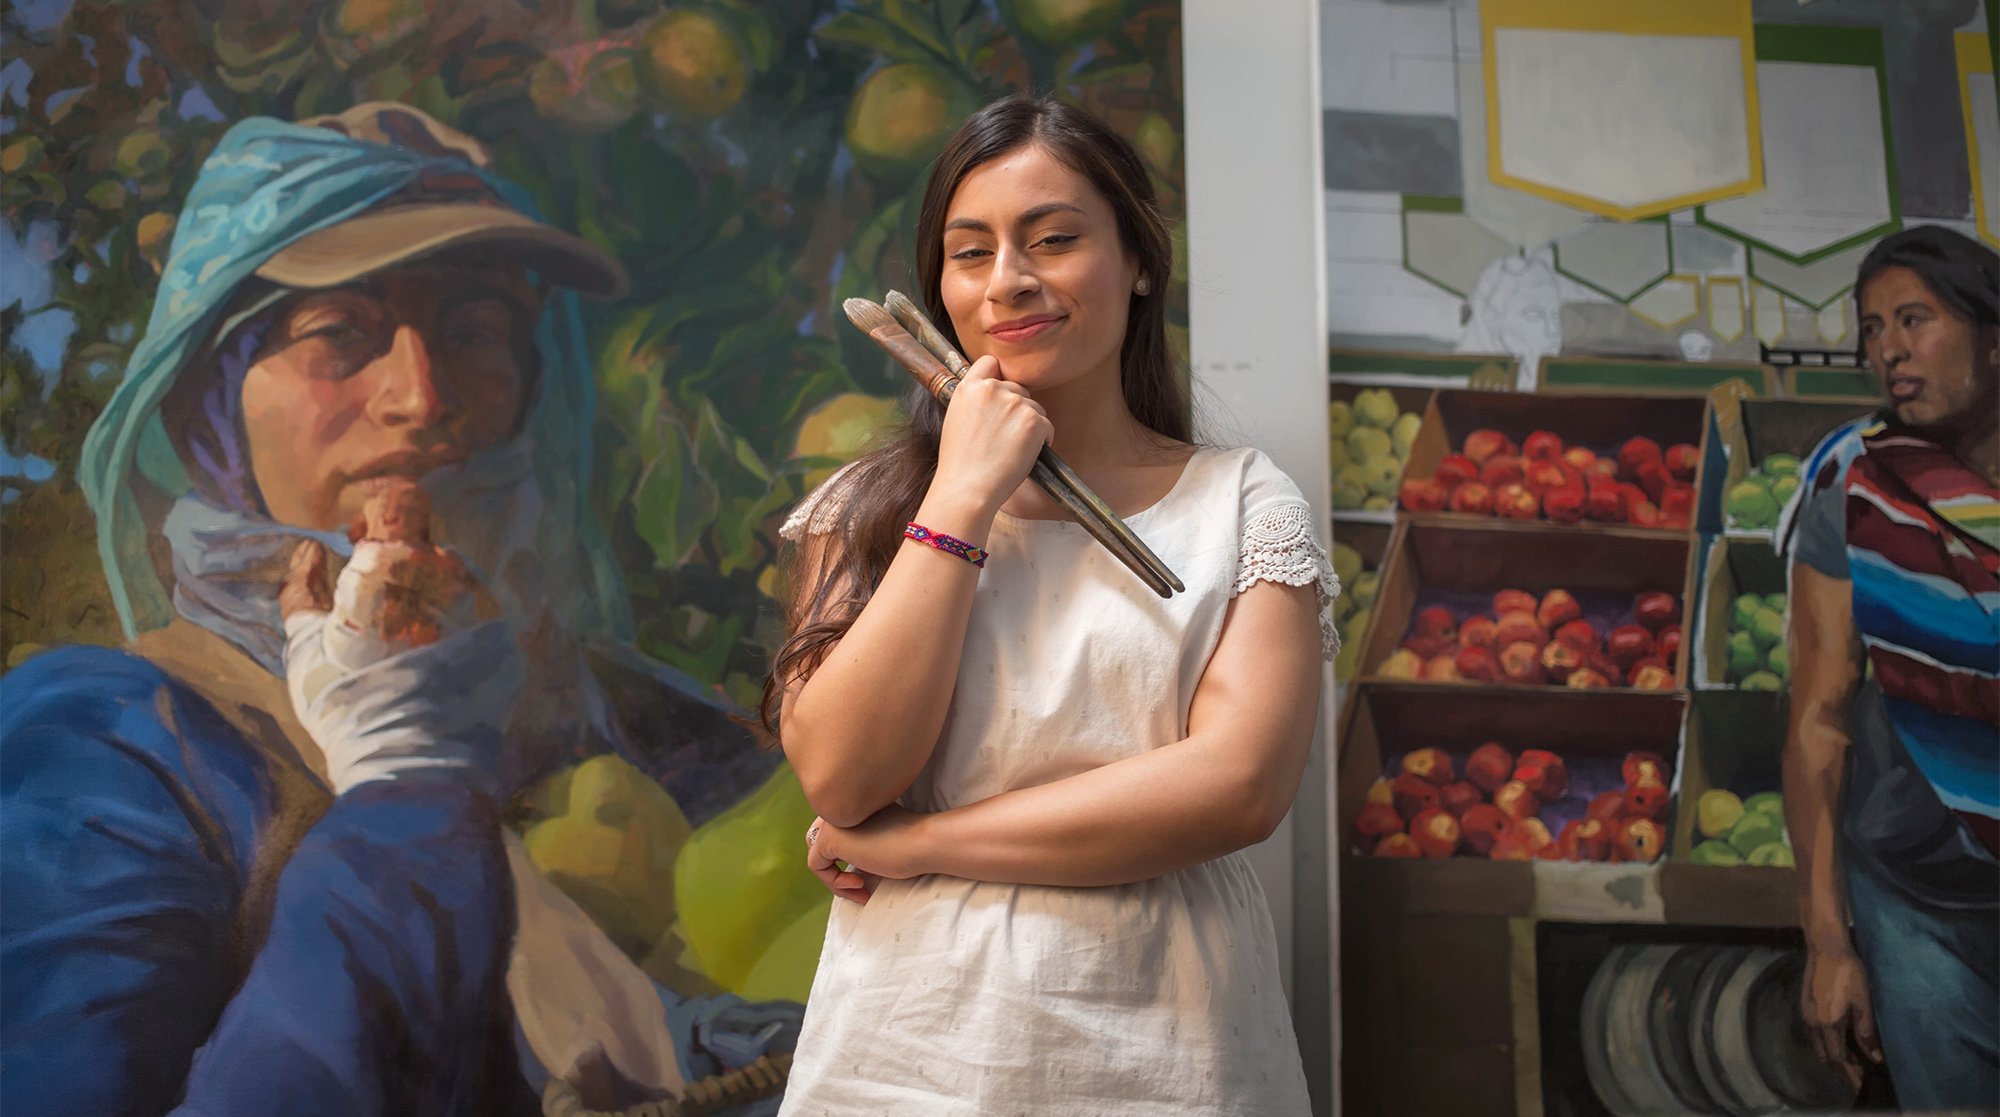 Arely Morales, Arely Morales painter, uw mfa, daca artist